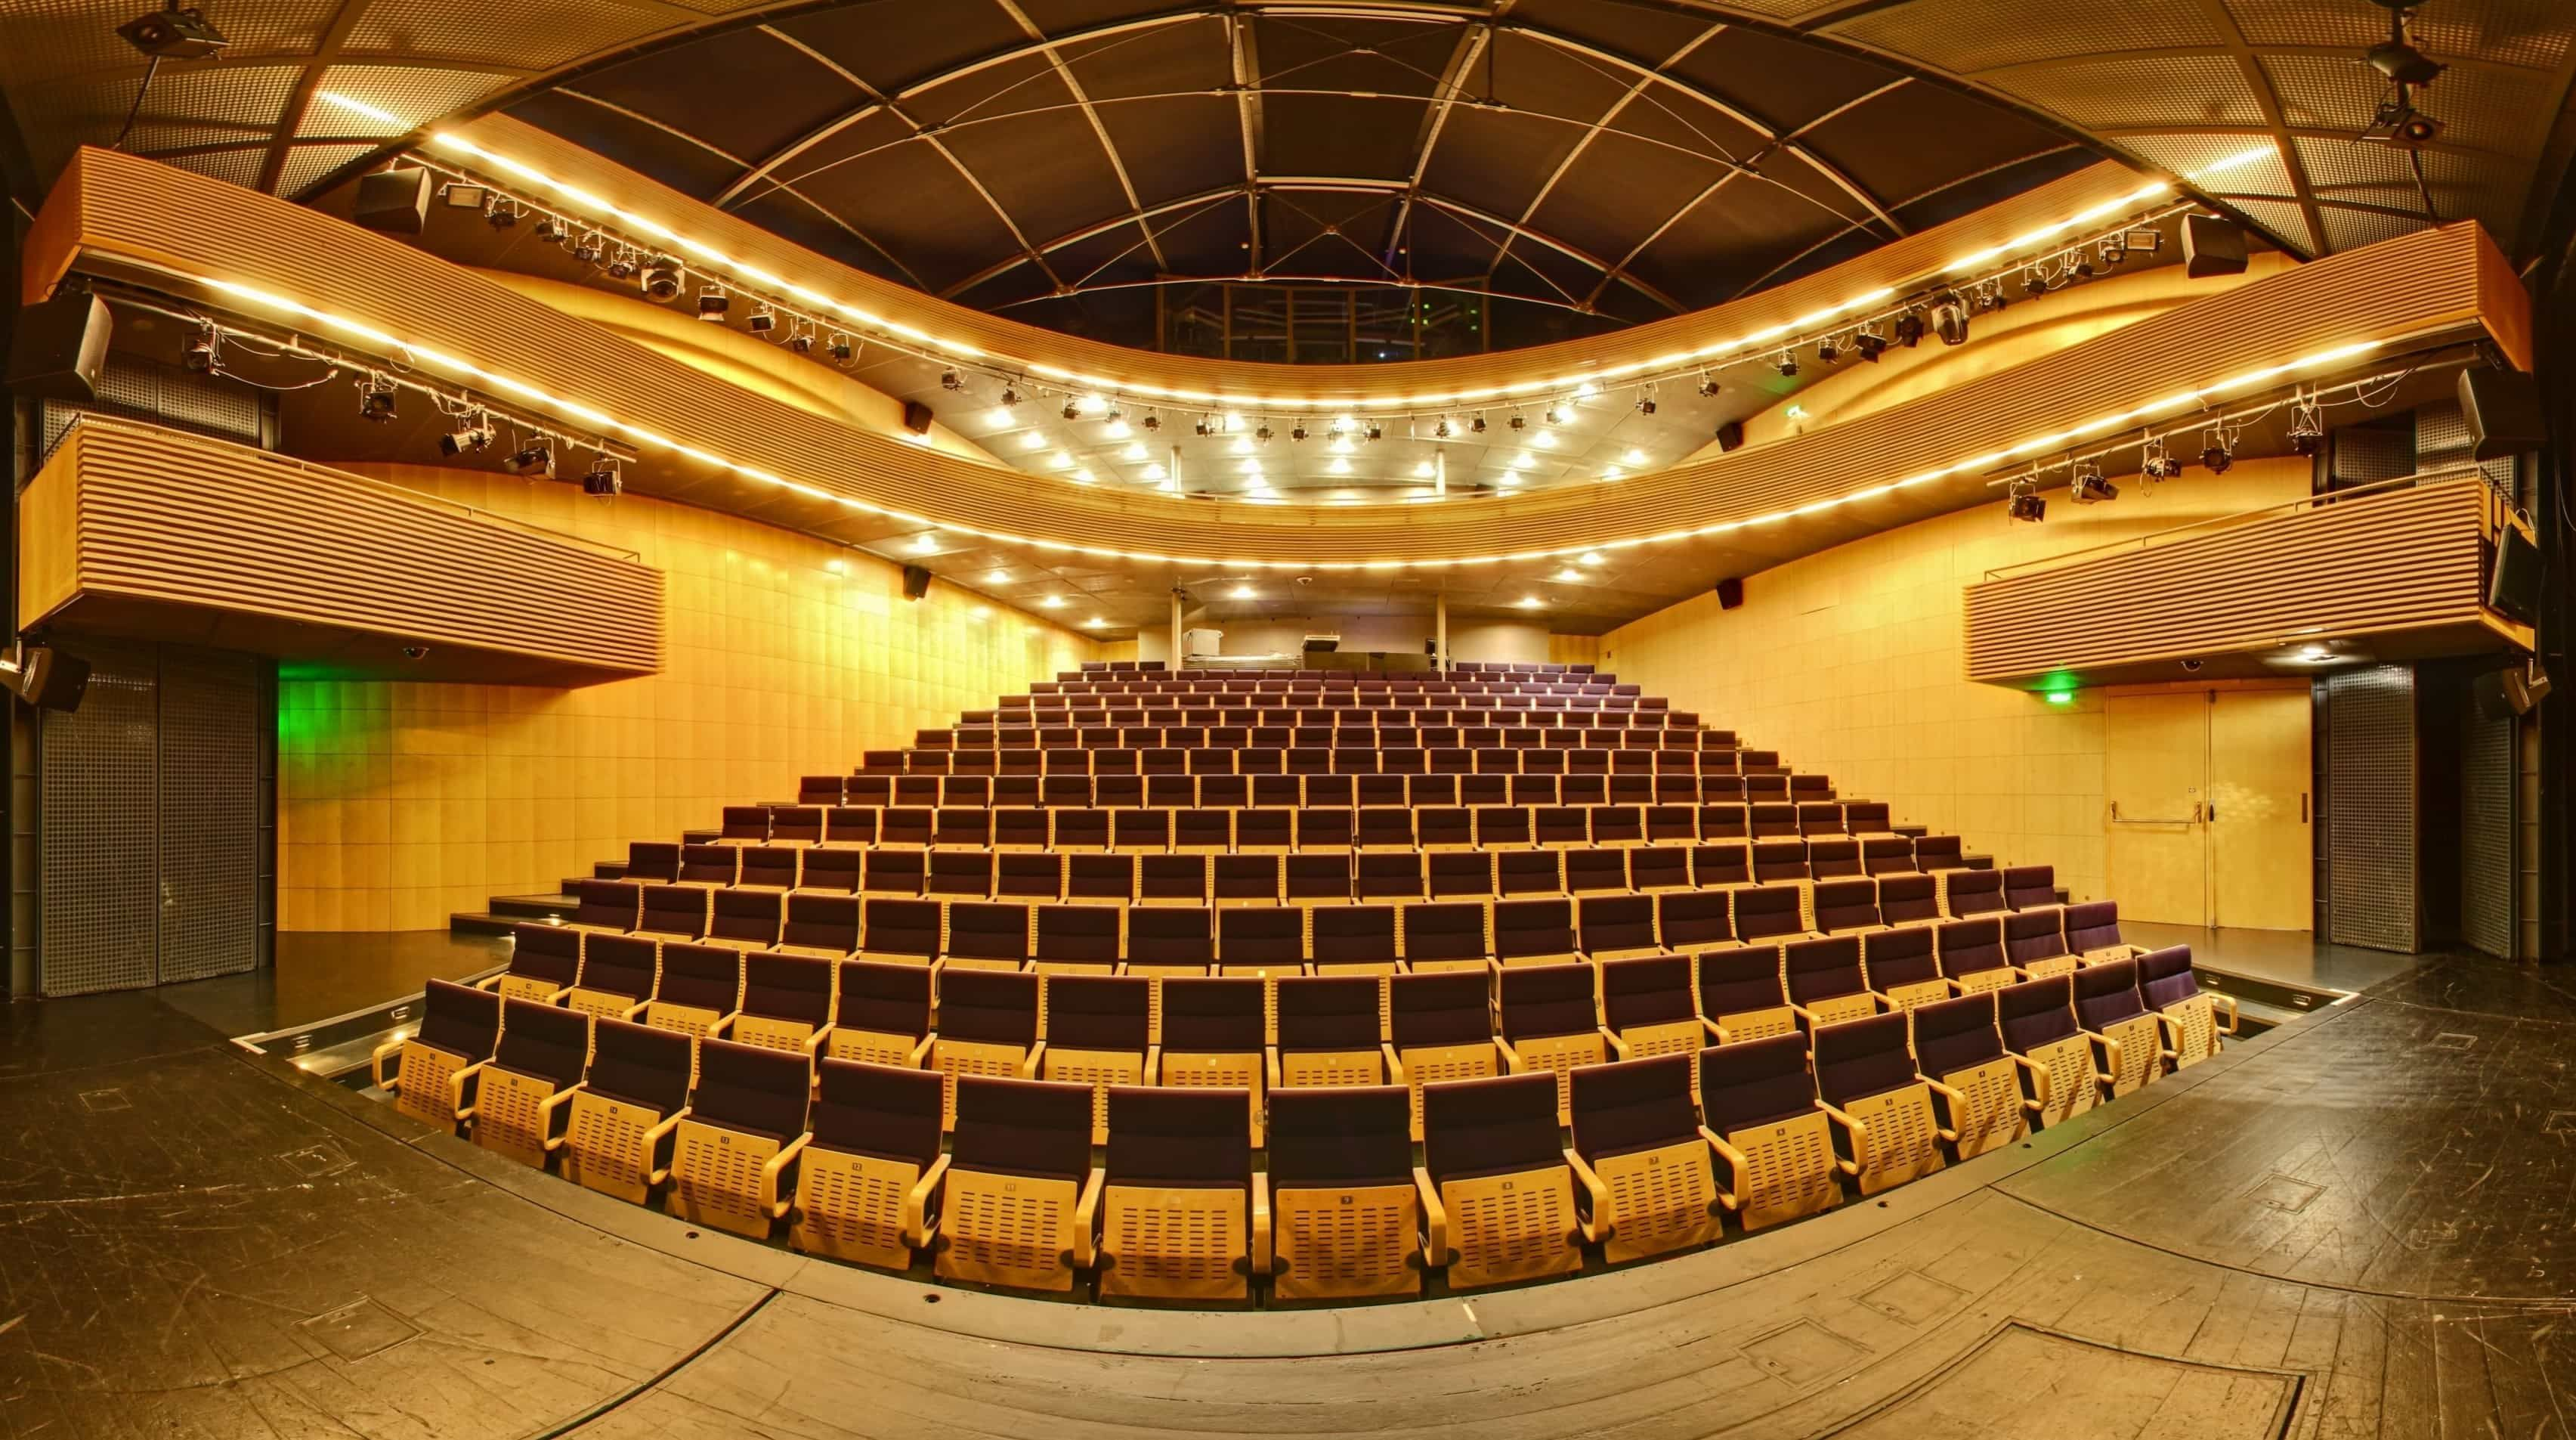 Divadlo Reduta v Brně, sál